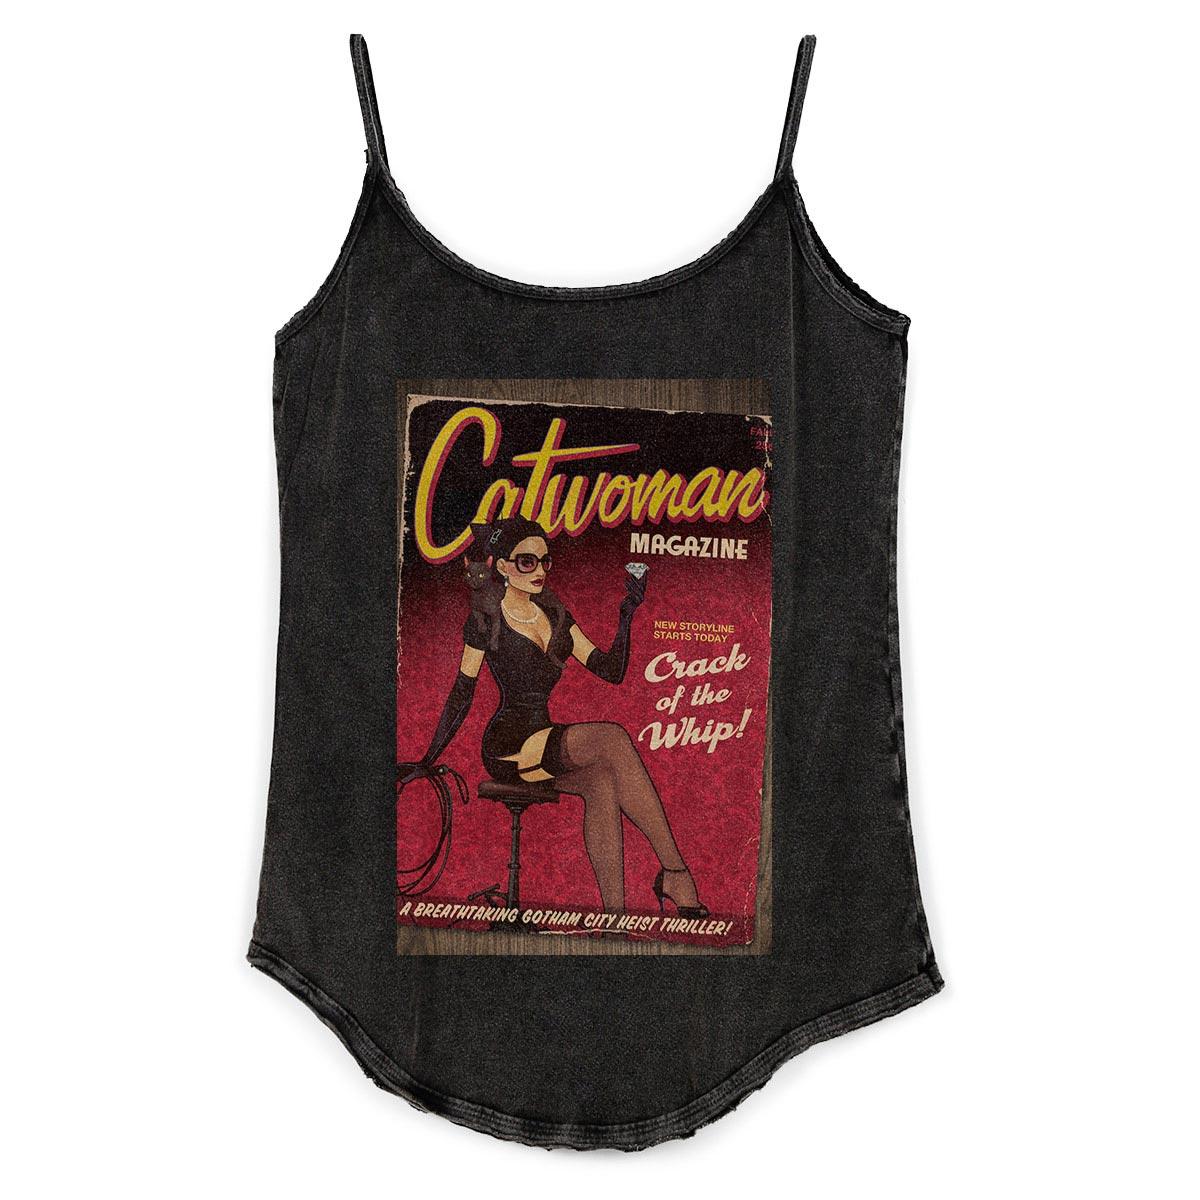 Regatinha Feminina Catwoman Magazine